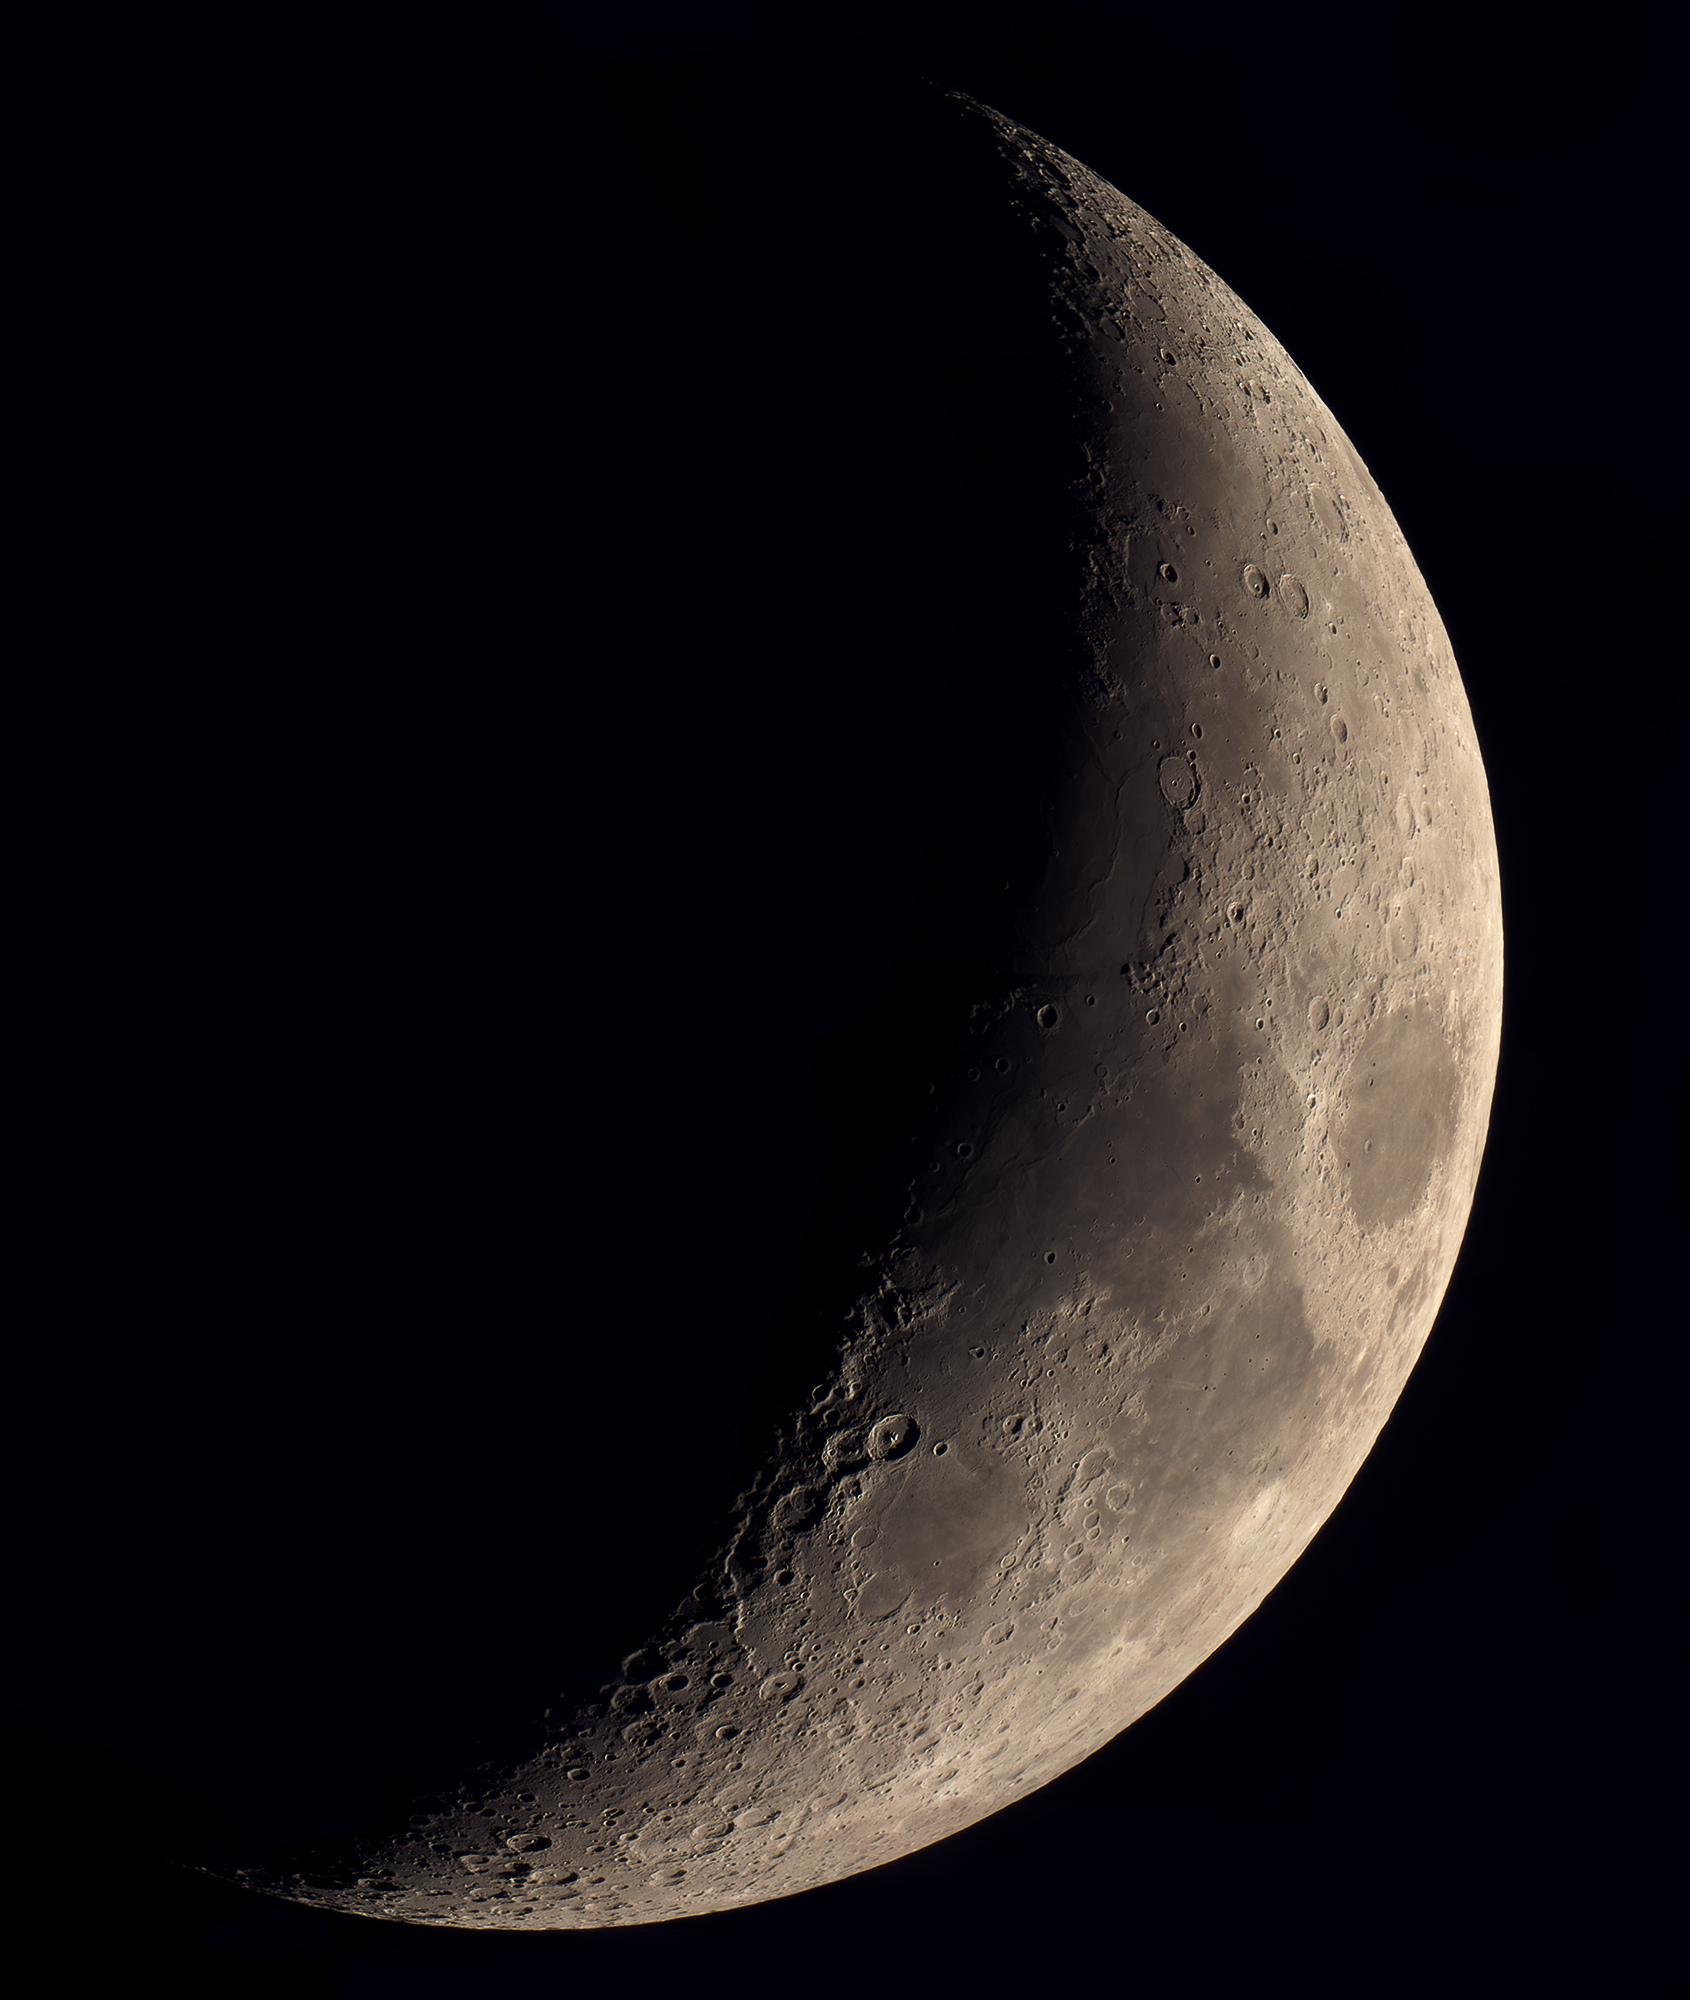 Lune-20180122.jpg